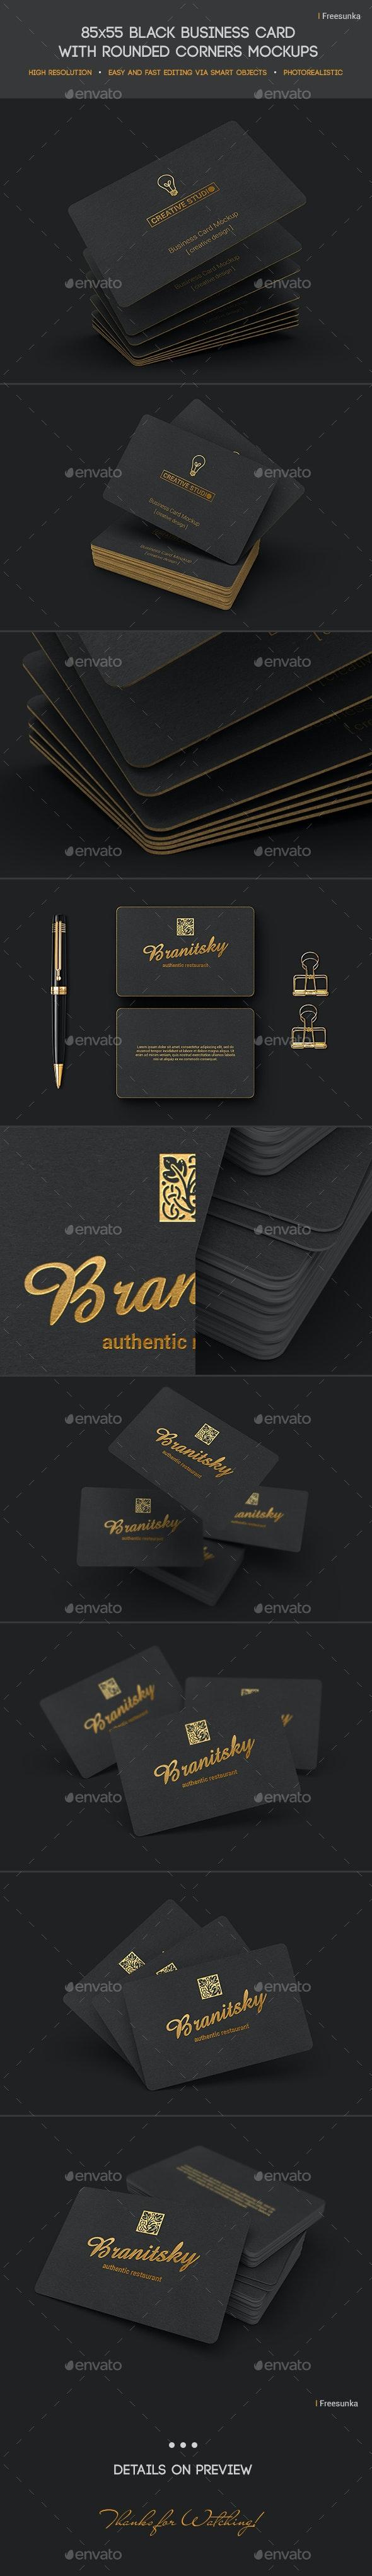 85x55 Black Business Card Mockups - Business Cards Print